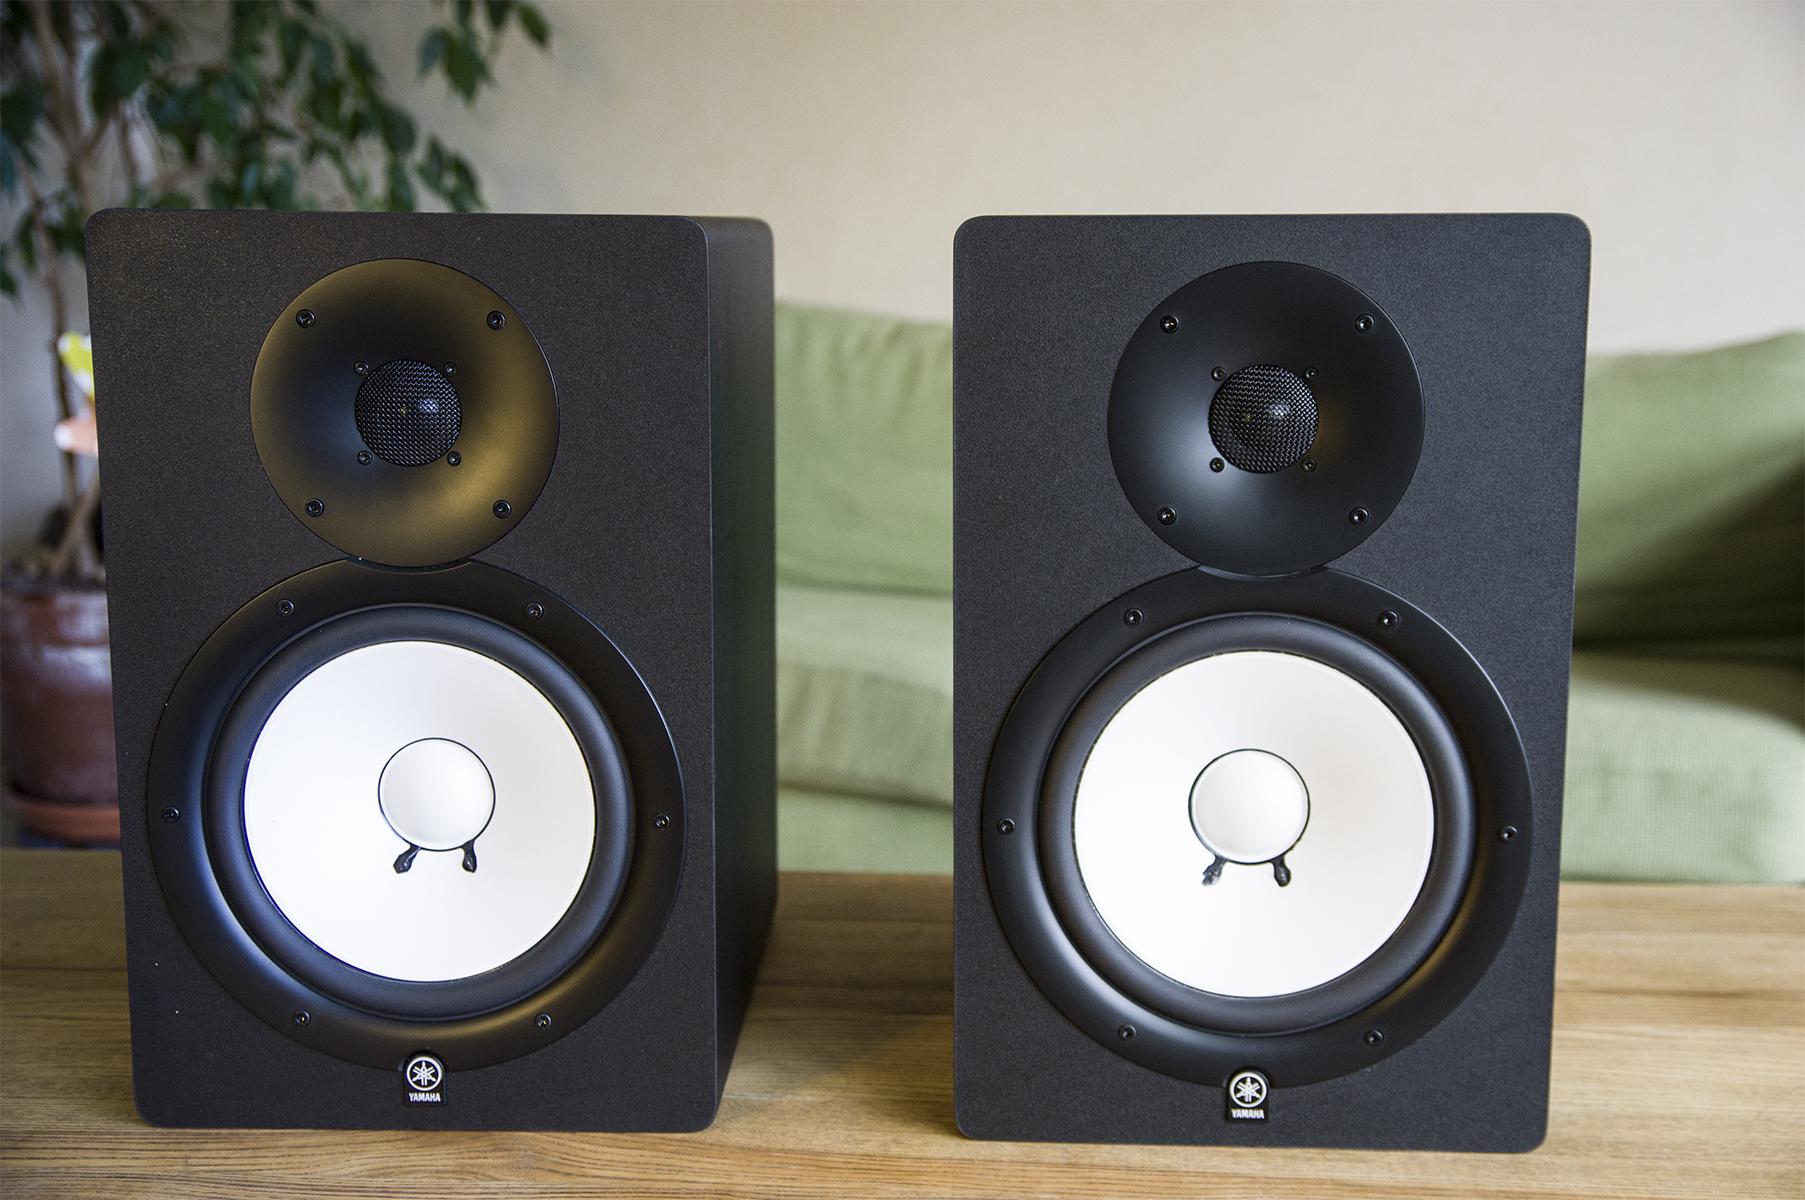 photo yamaha hs80m yamaha hs80m 20766 1145598. Black Bedroom Furniture Sets. Home Design Ideas